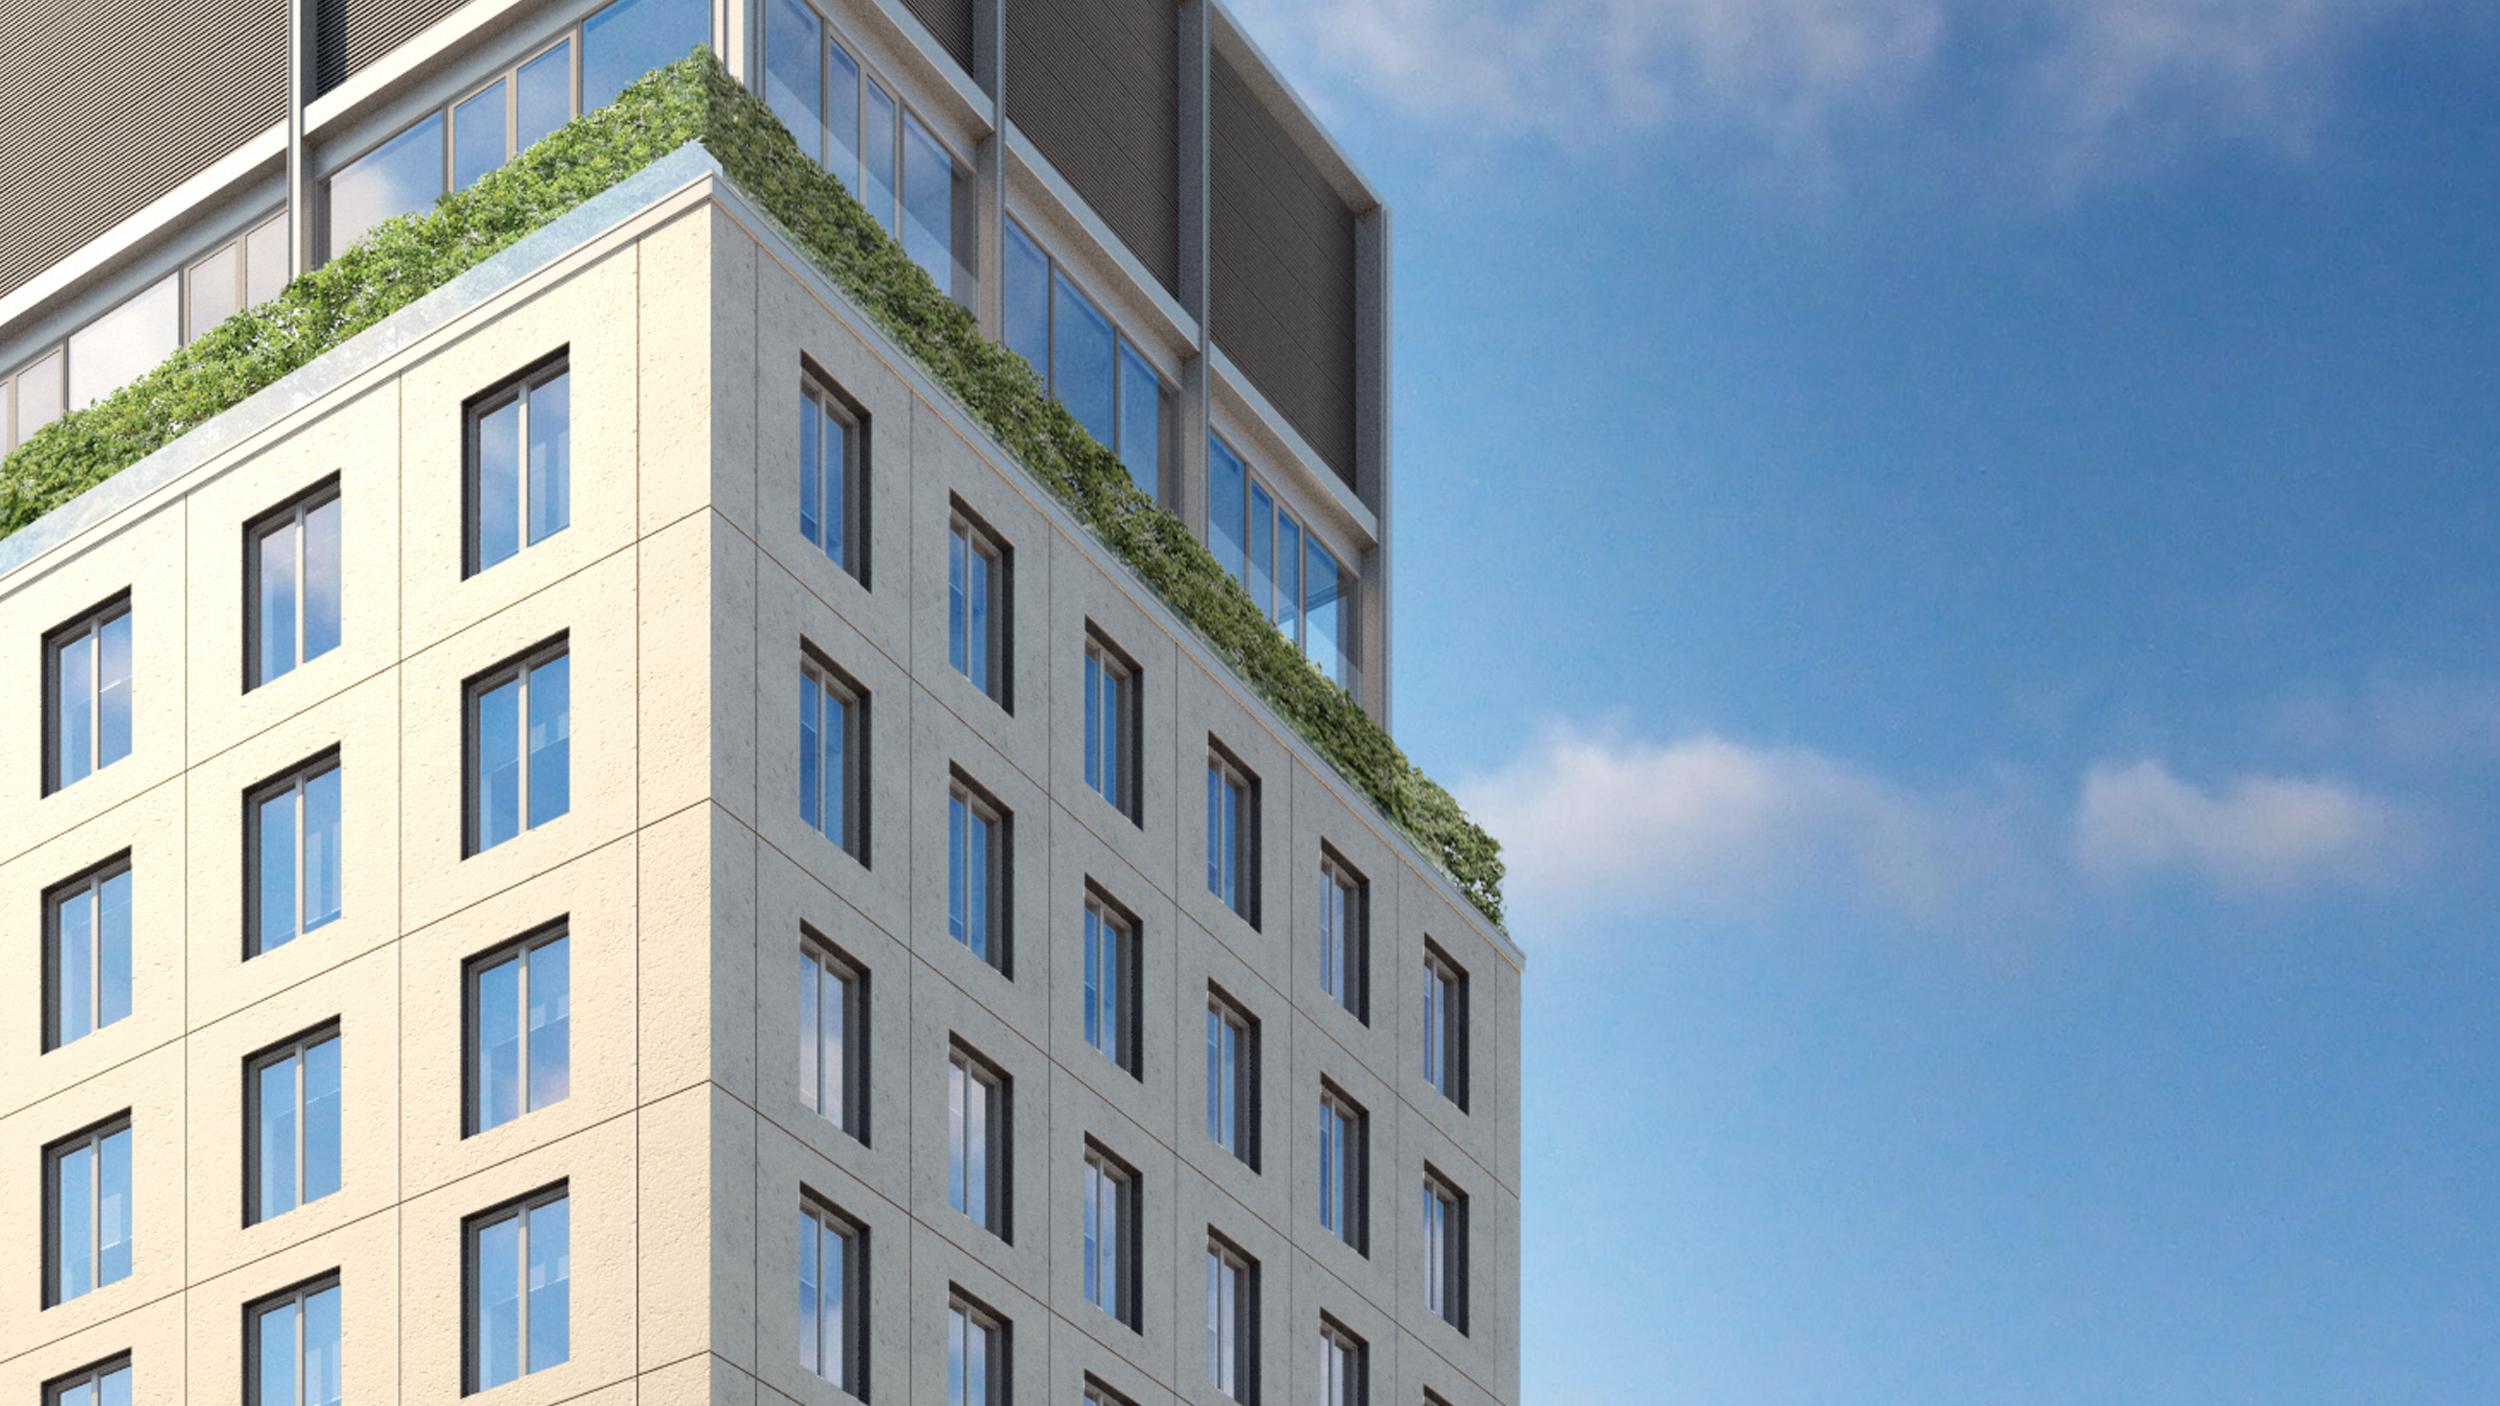 21 East 12th Street facade, rendering by Wordsearch